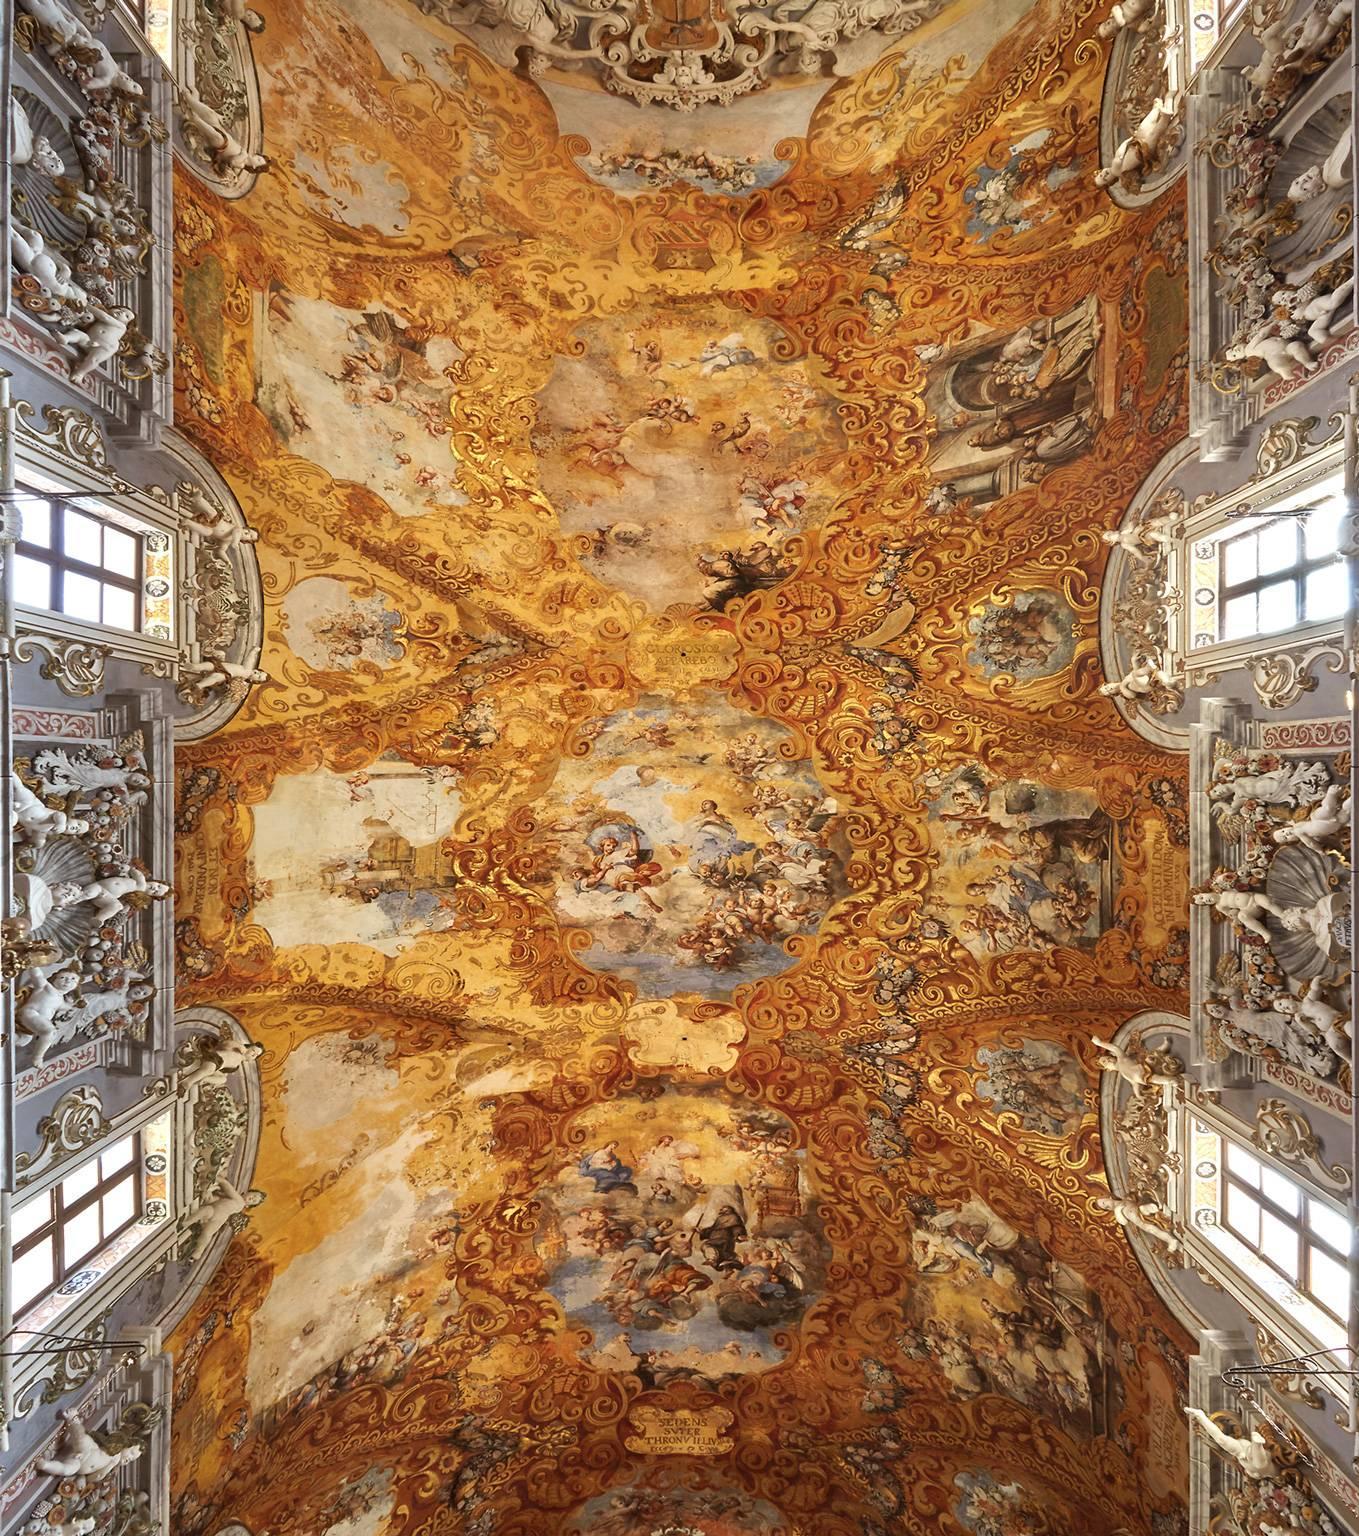 Hallelujah - large format photograph of baroque Italian palazzo fresco ceiling